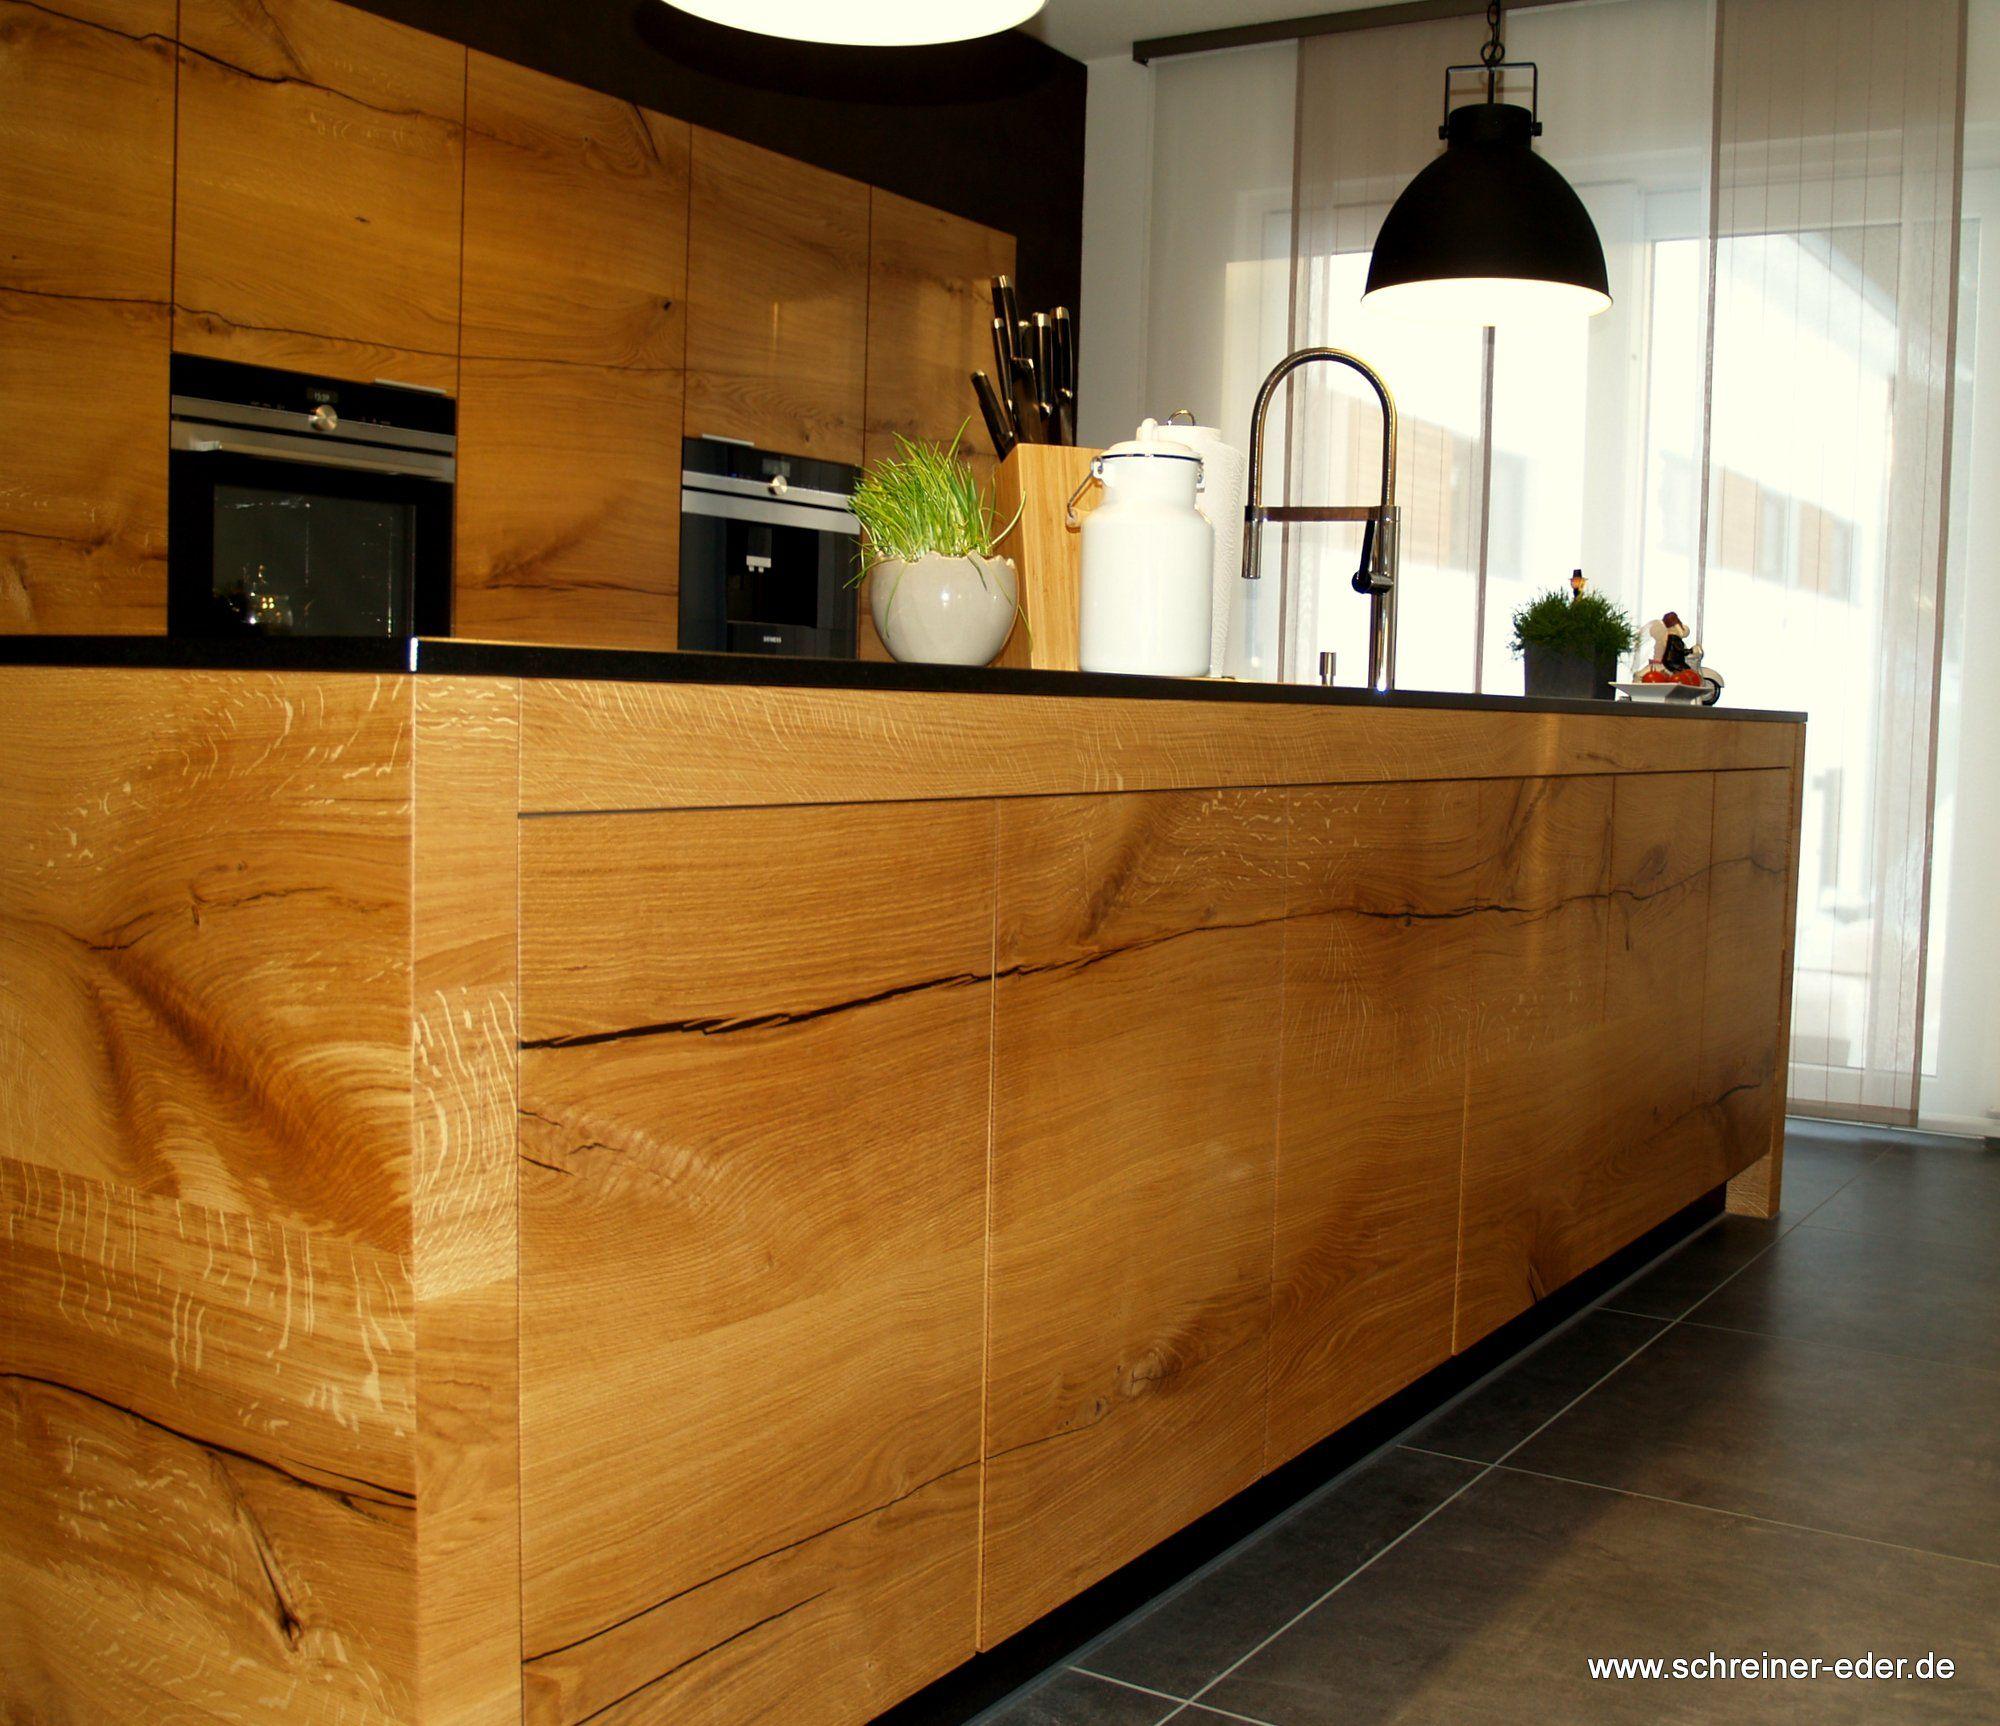 Große Kücheninsel mit Massiholzfront aus Donau Eiche Oberfläche #0: de0f146ea5a0ca38e92bf1f c4